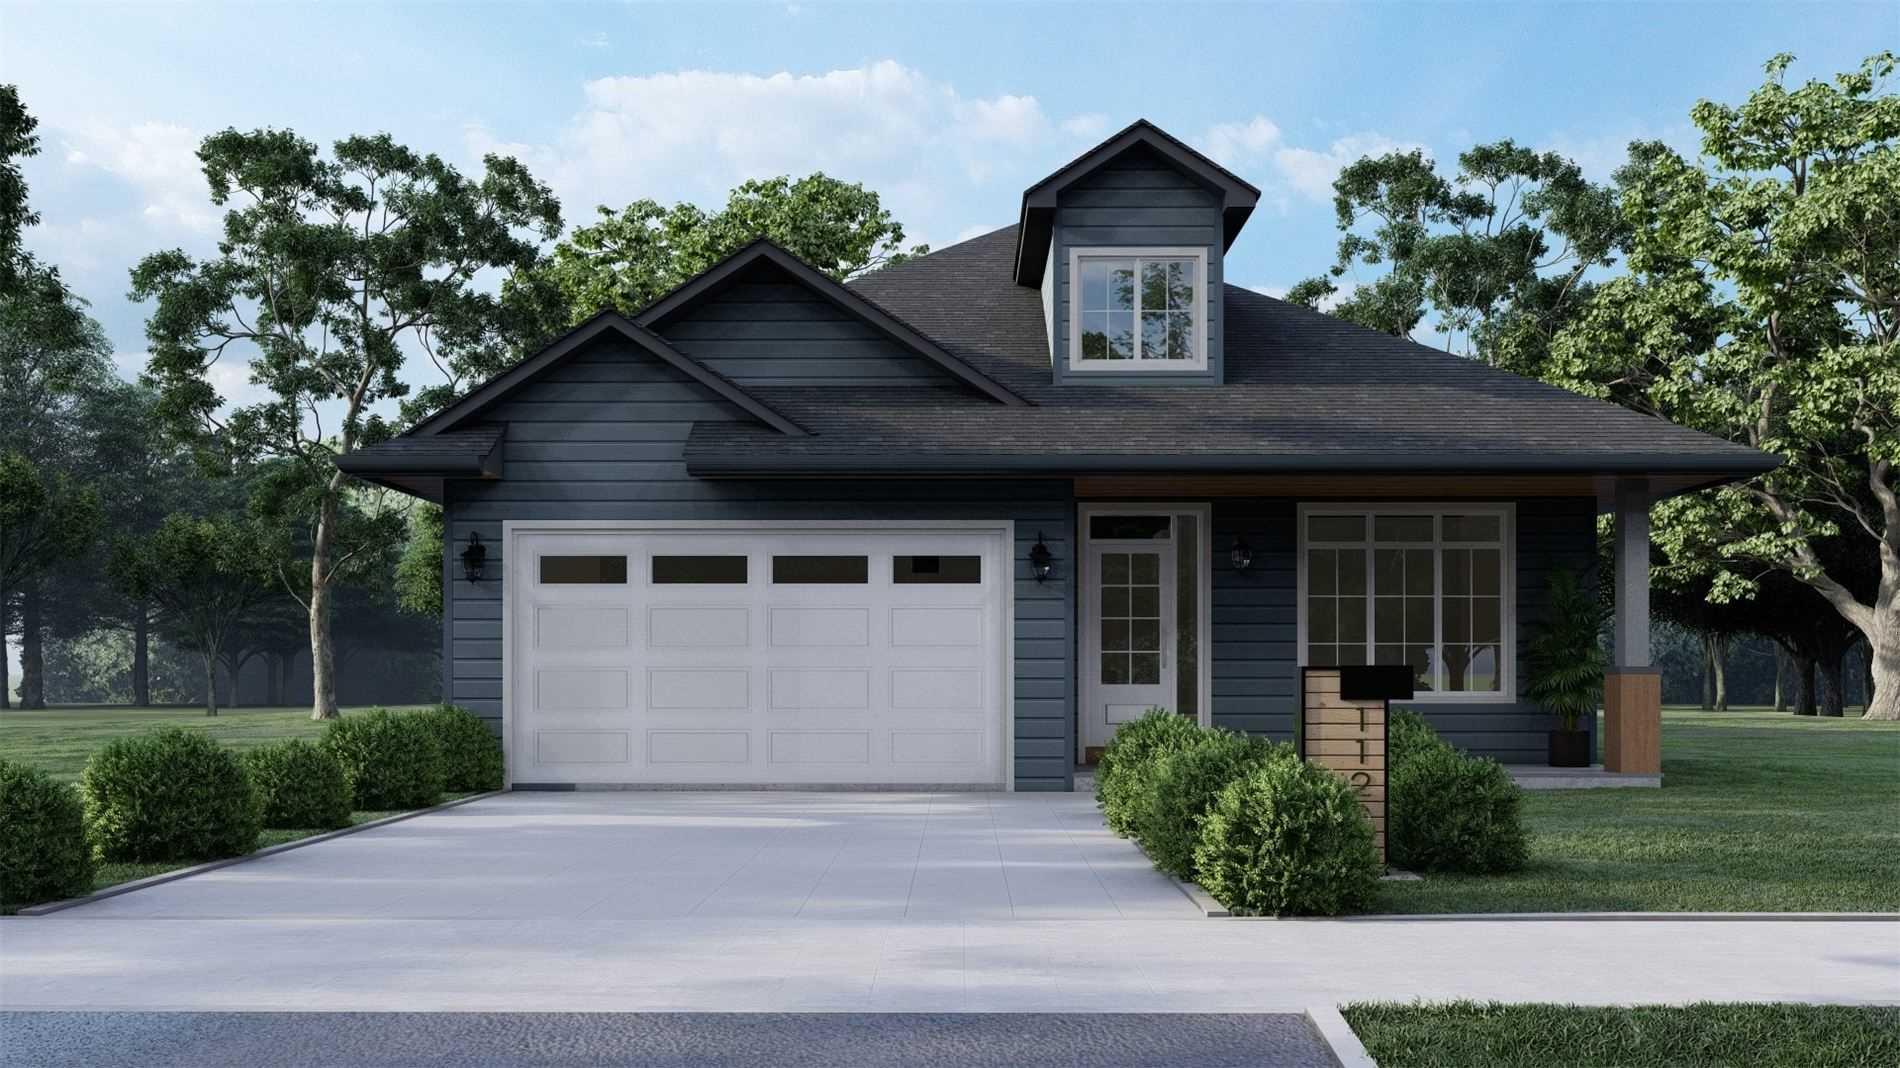 535 Cathcart Blvd, Sarnia, Ontario N7V2N1, 2 Bedrooms Bedrooms, 7 Rooms Rooms,2 BathroomsBathrooms,Detached,For Sale,Cathcart,X5316710